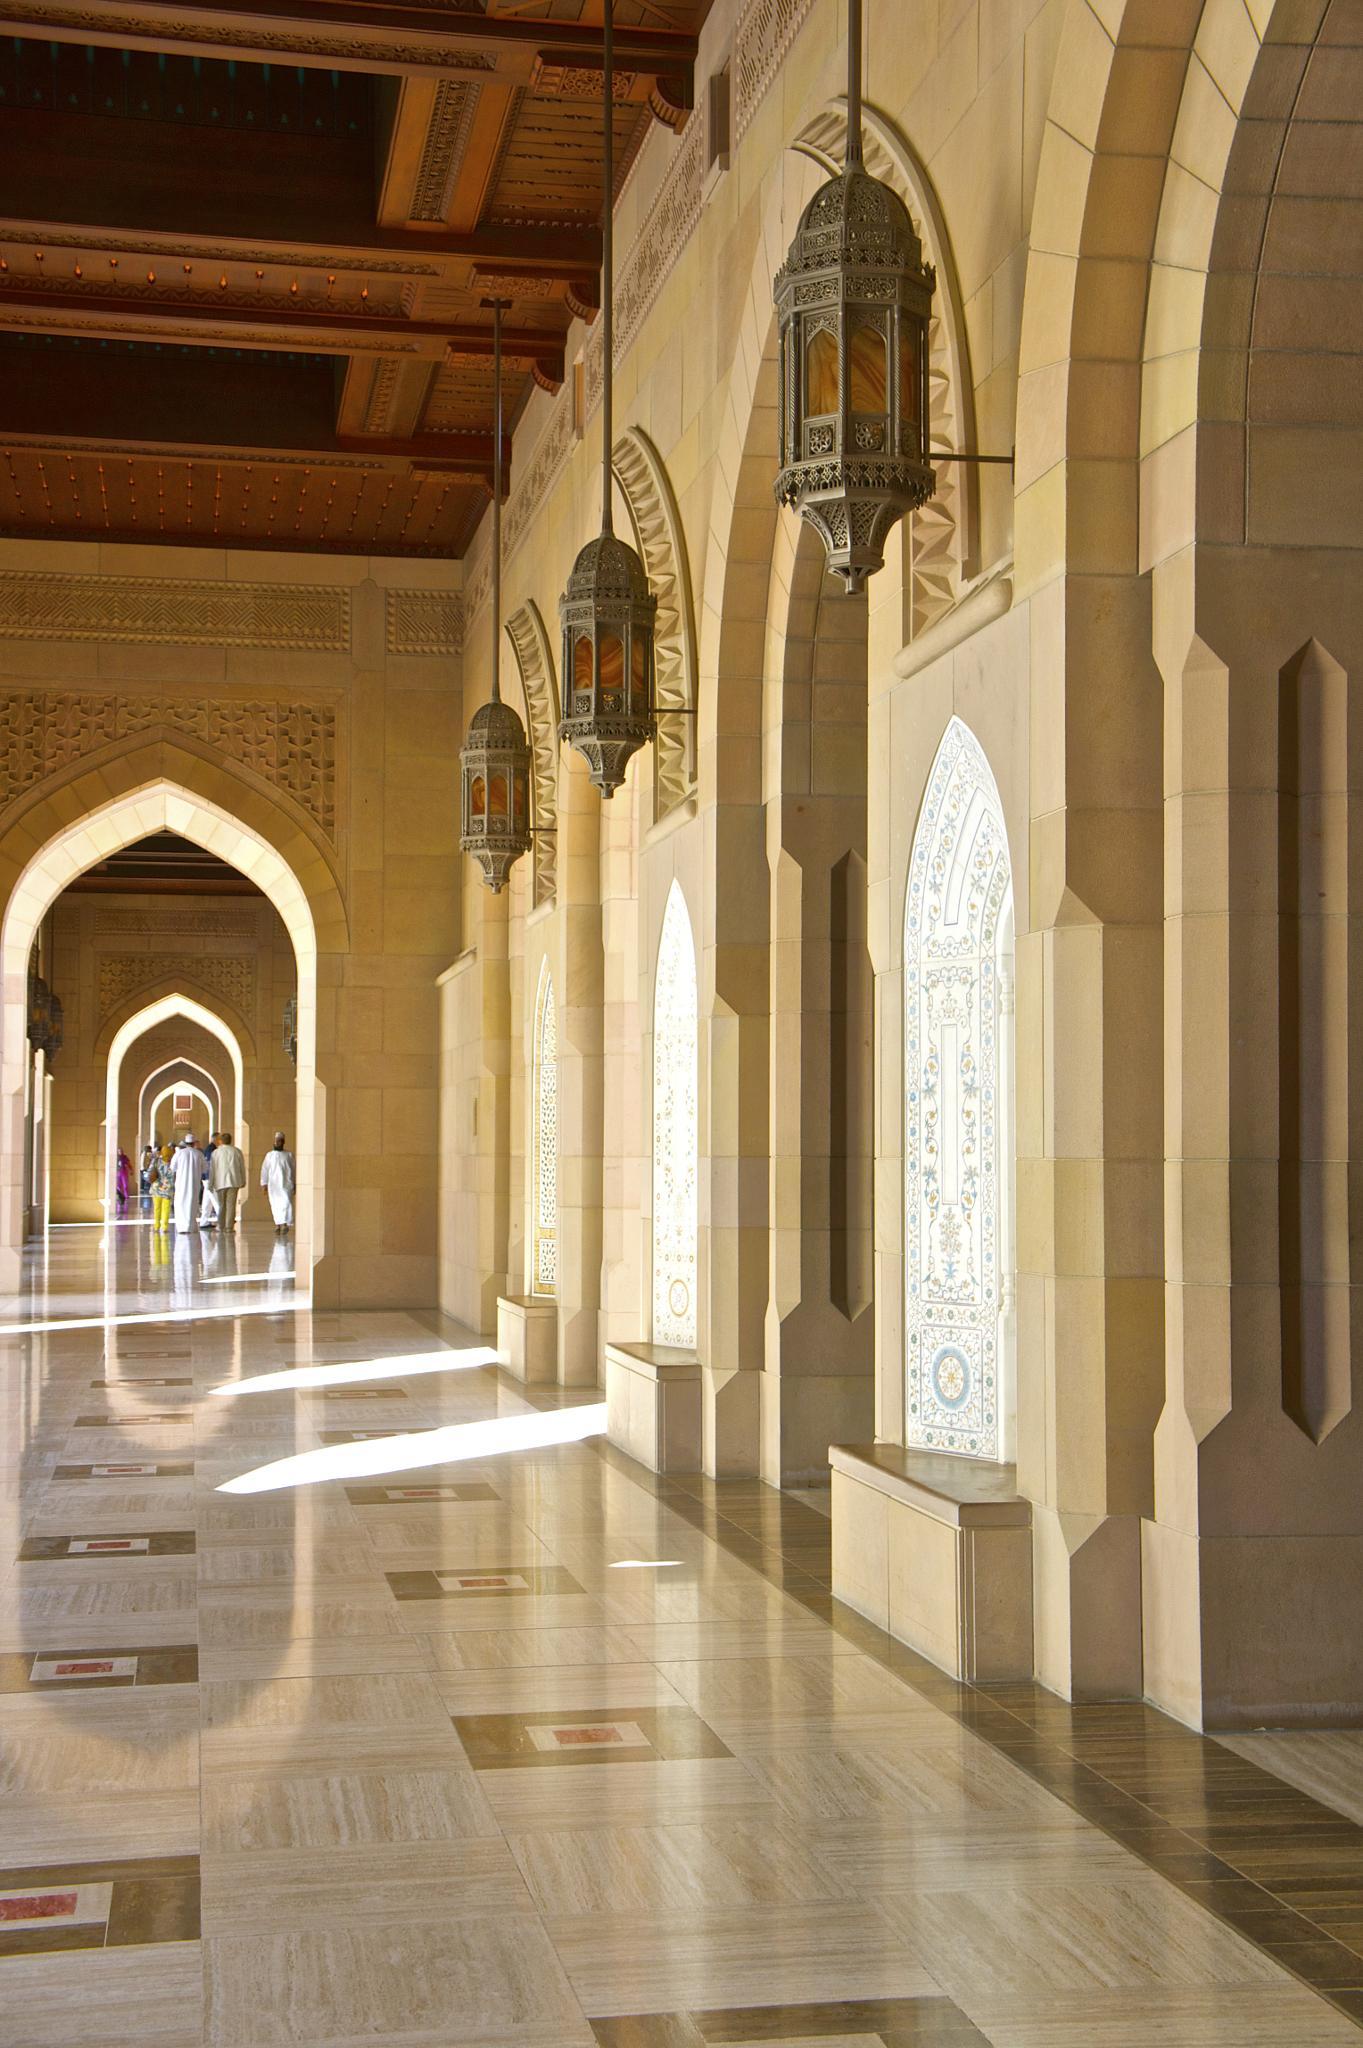 Grand Mosque Interior by Jacqui Shepherd